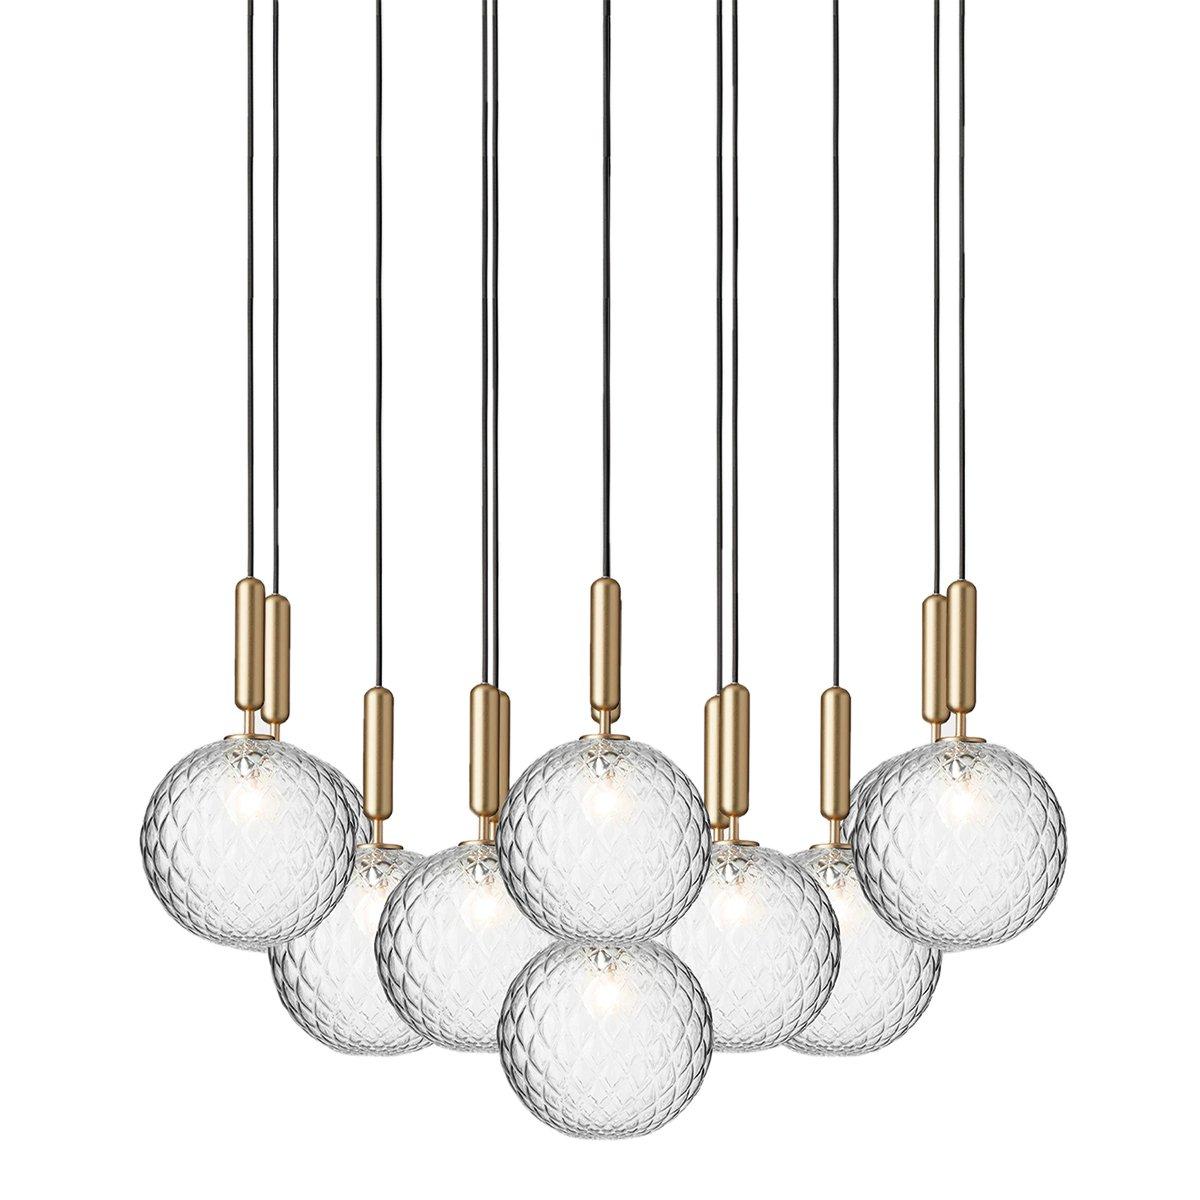 Nuura Miira 13 Hanglamp Large - Brass / Optic Clear